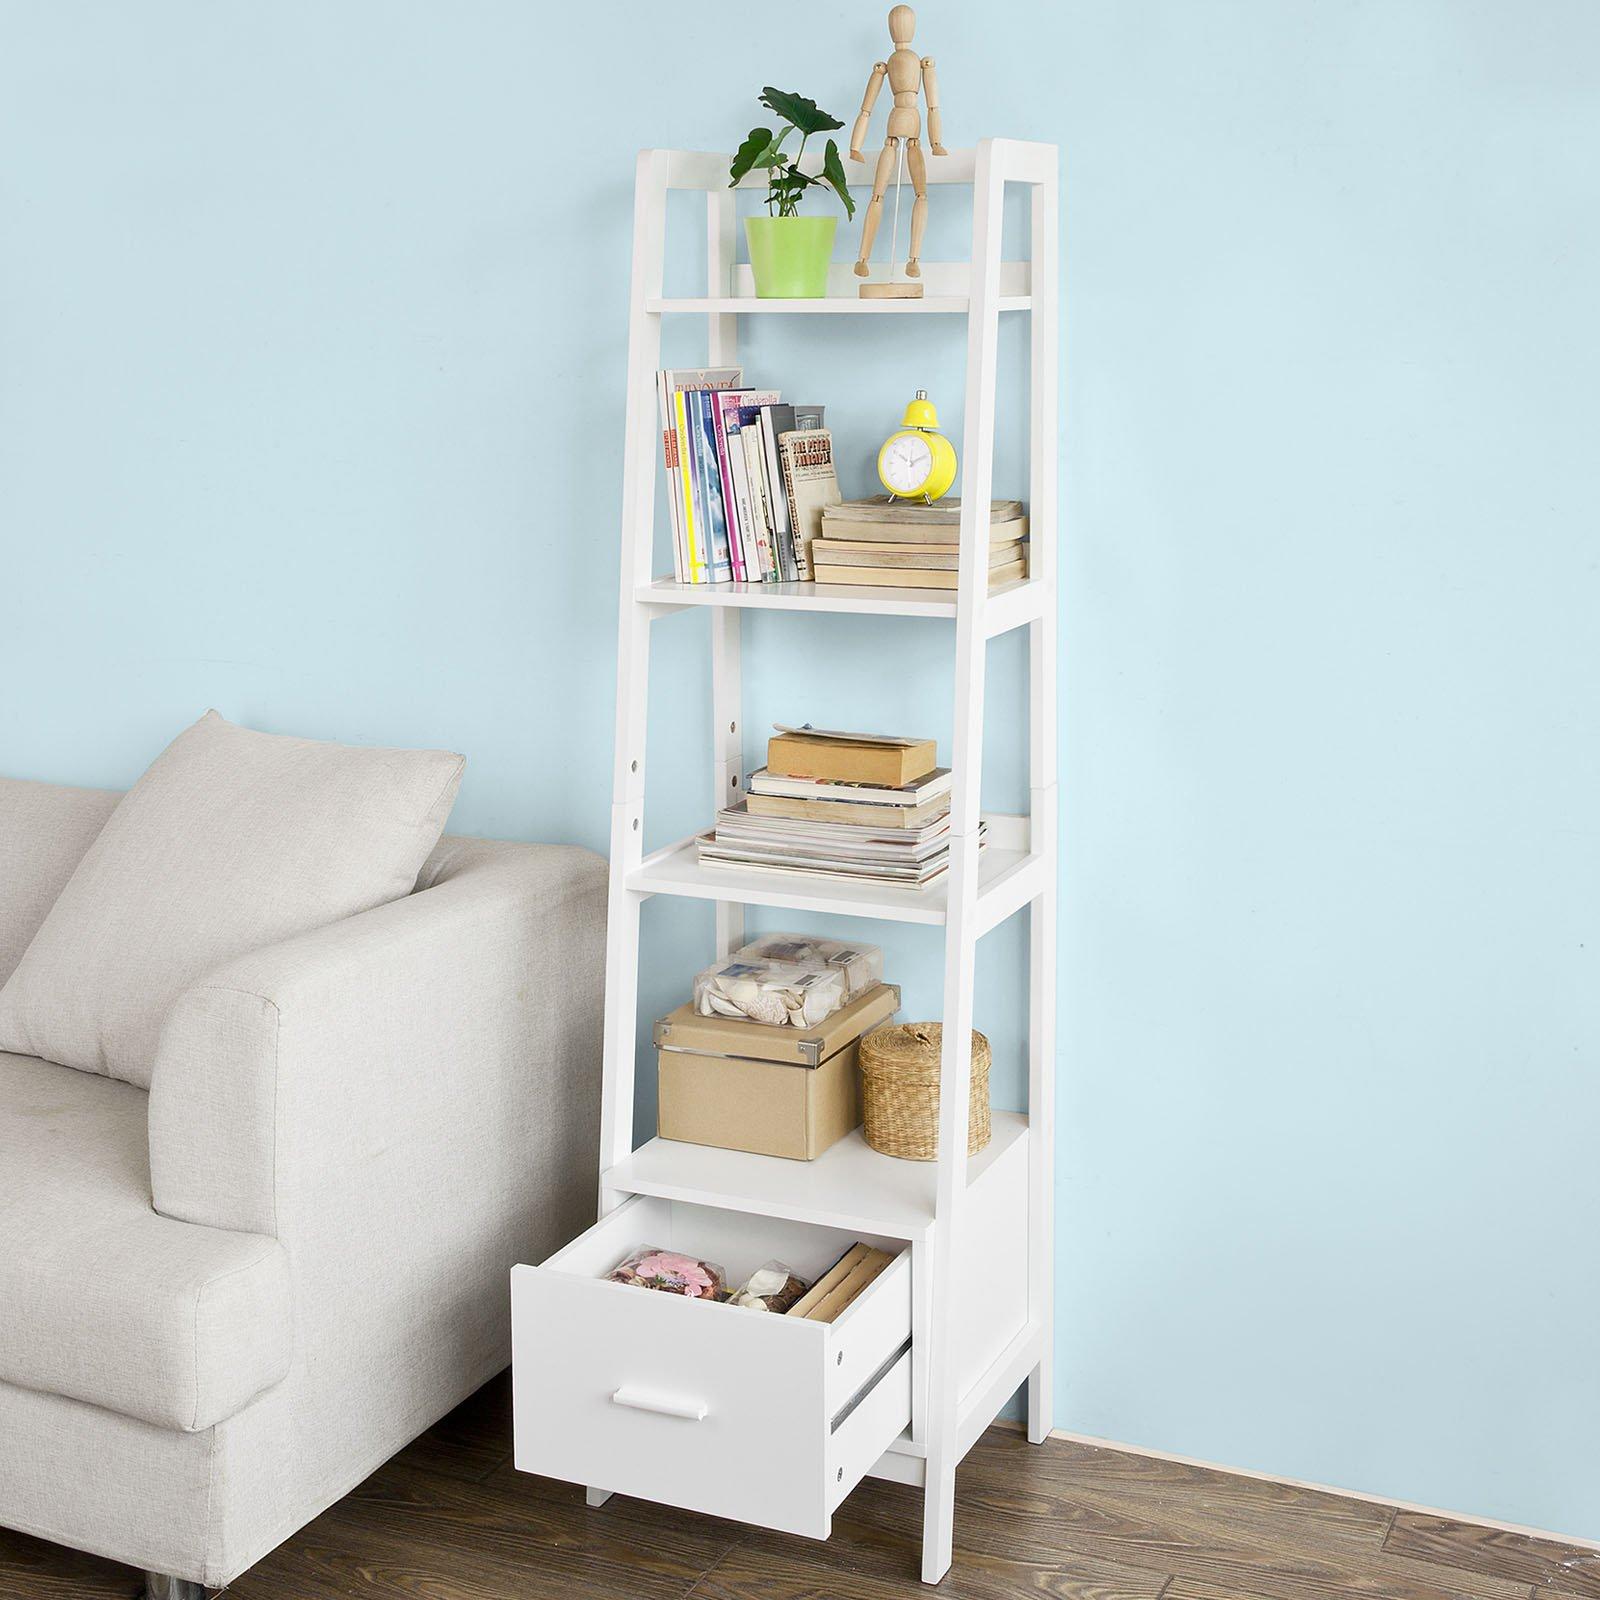 SoBuy Haotian Modern ladder bookcase made of wood, book shelf,stand shelf, wall shelf (FRG116-K-W) by SoBuy (Image #2)